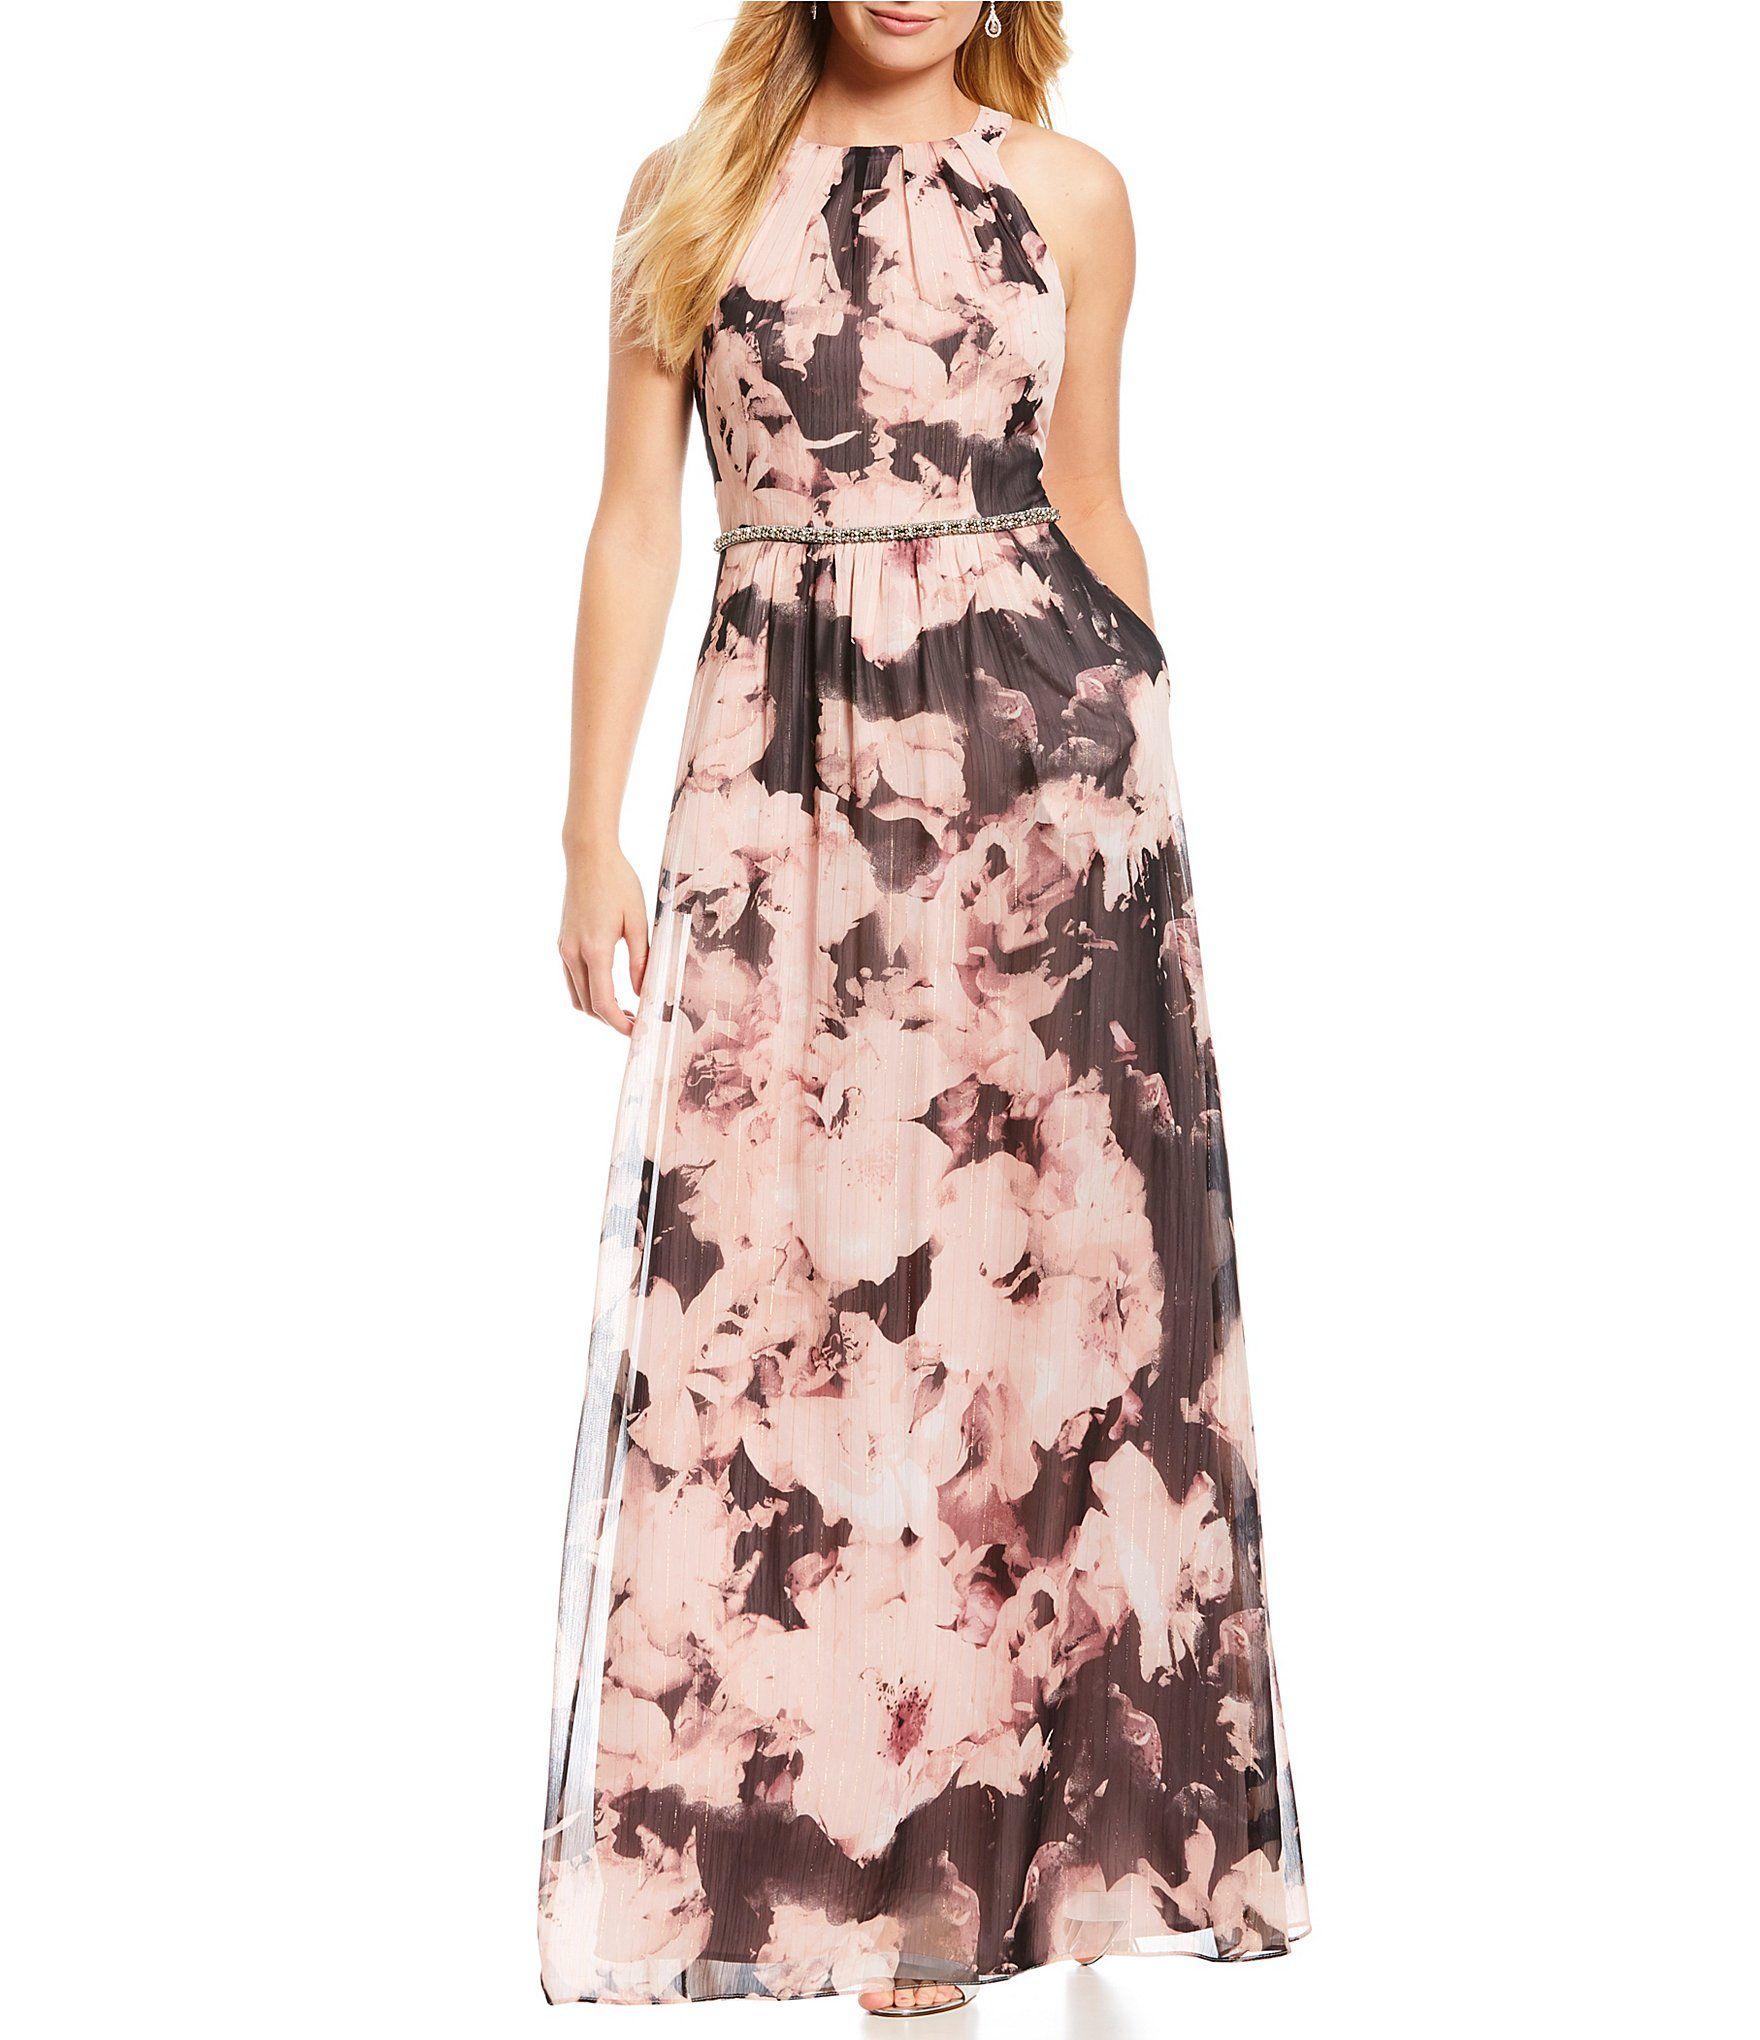 781c0494e4a Ignite Evenings Sleeveless Floral Printed Chiffon Maxi Dress  Dillards